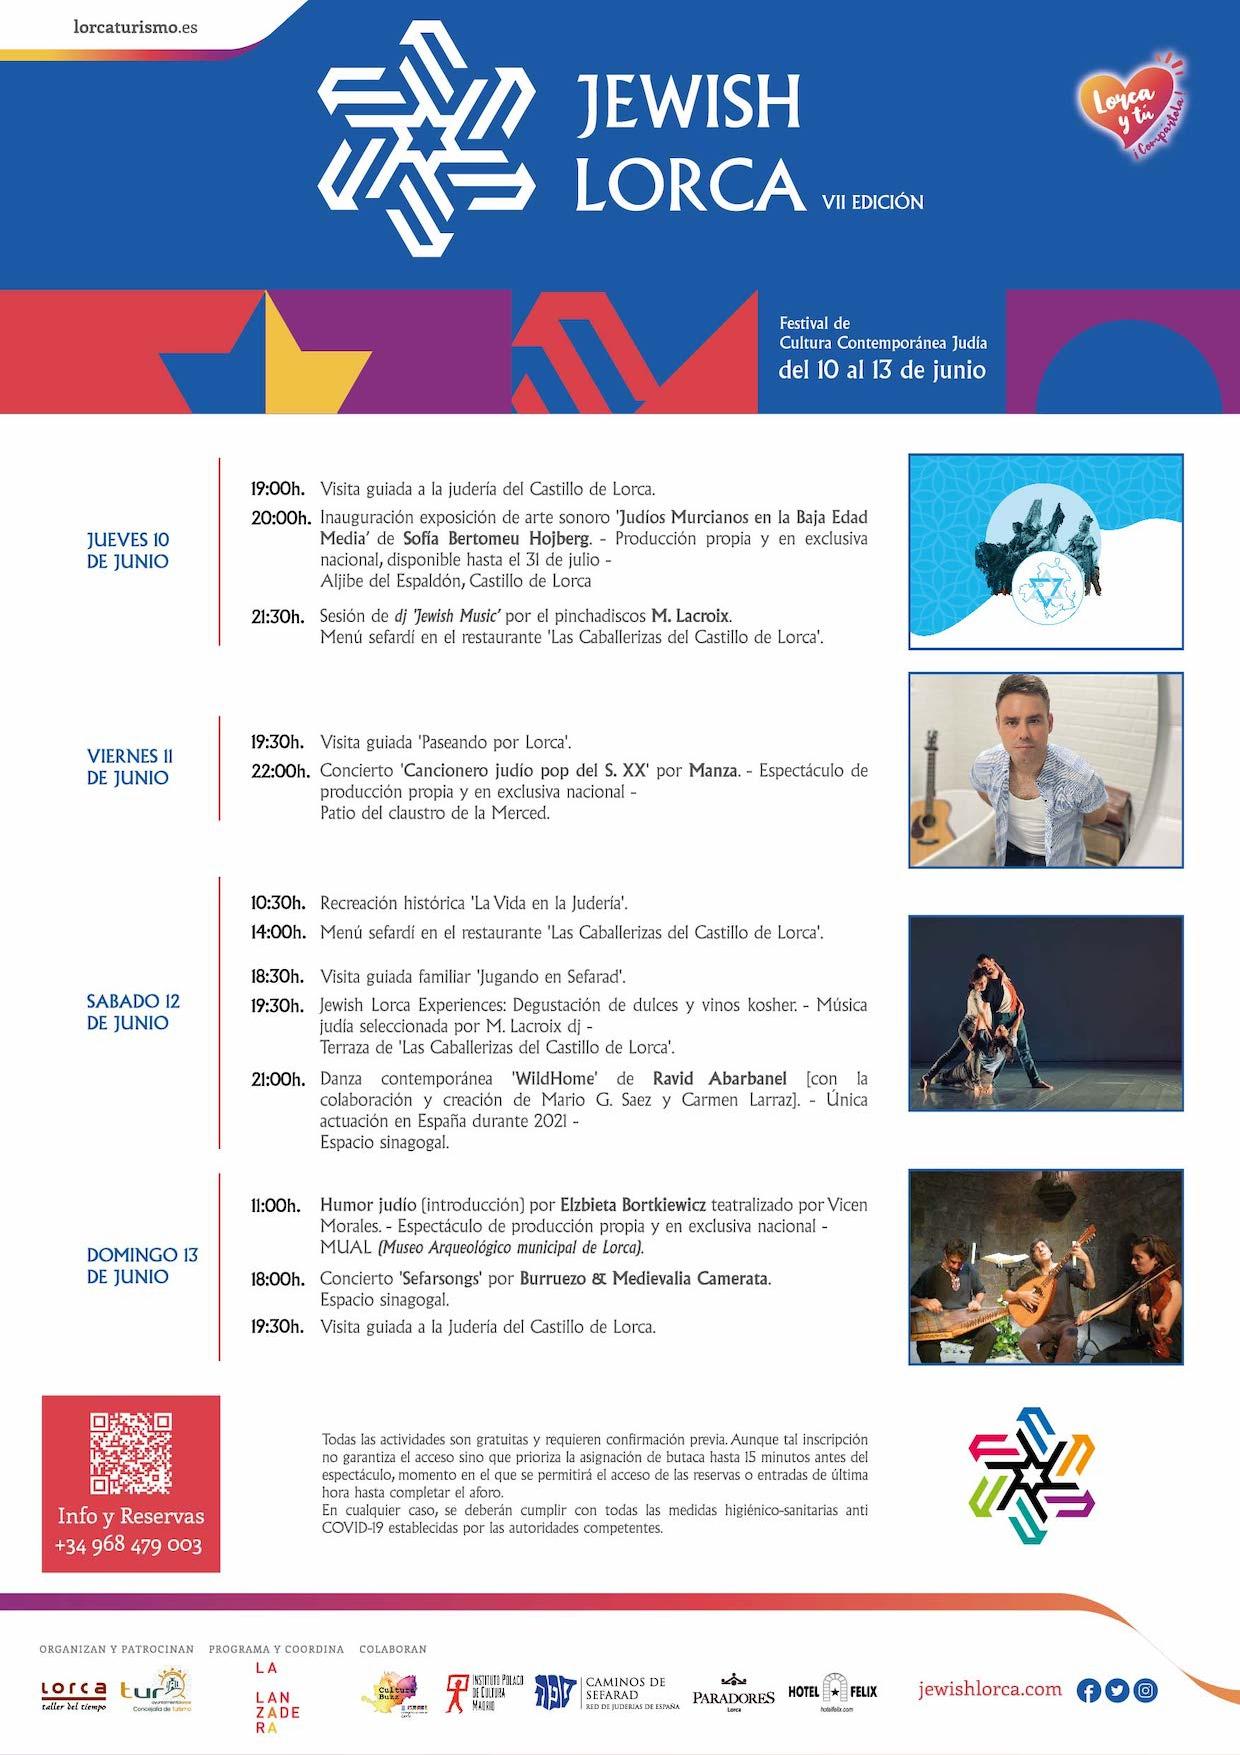 programacin-Jewish-Lorca-2021_page-0001.jpg